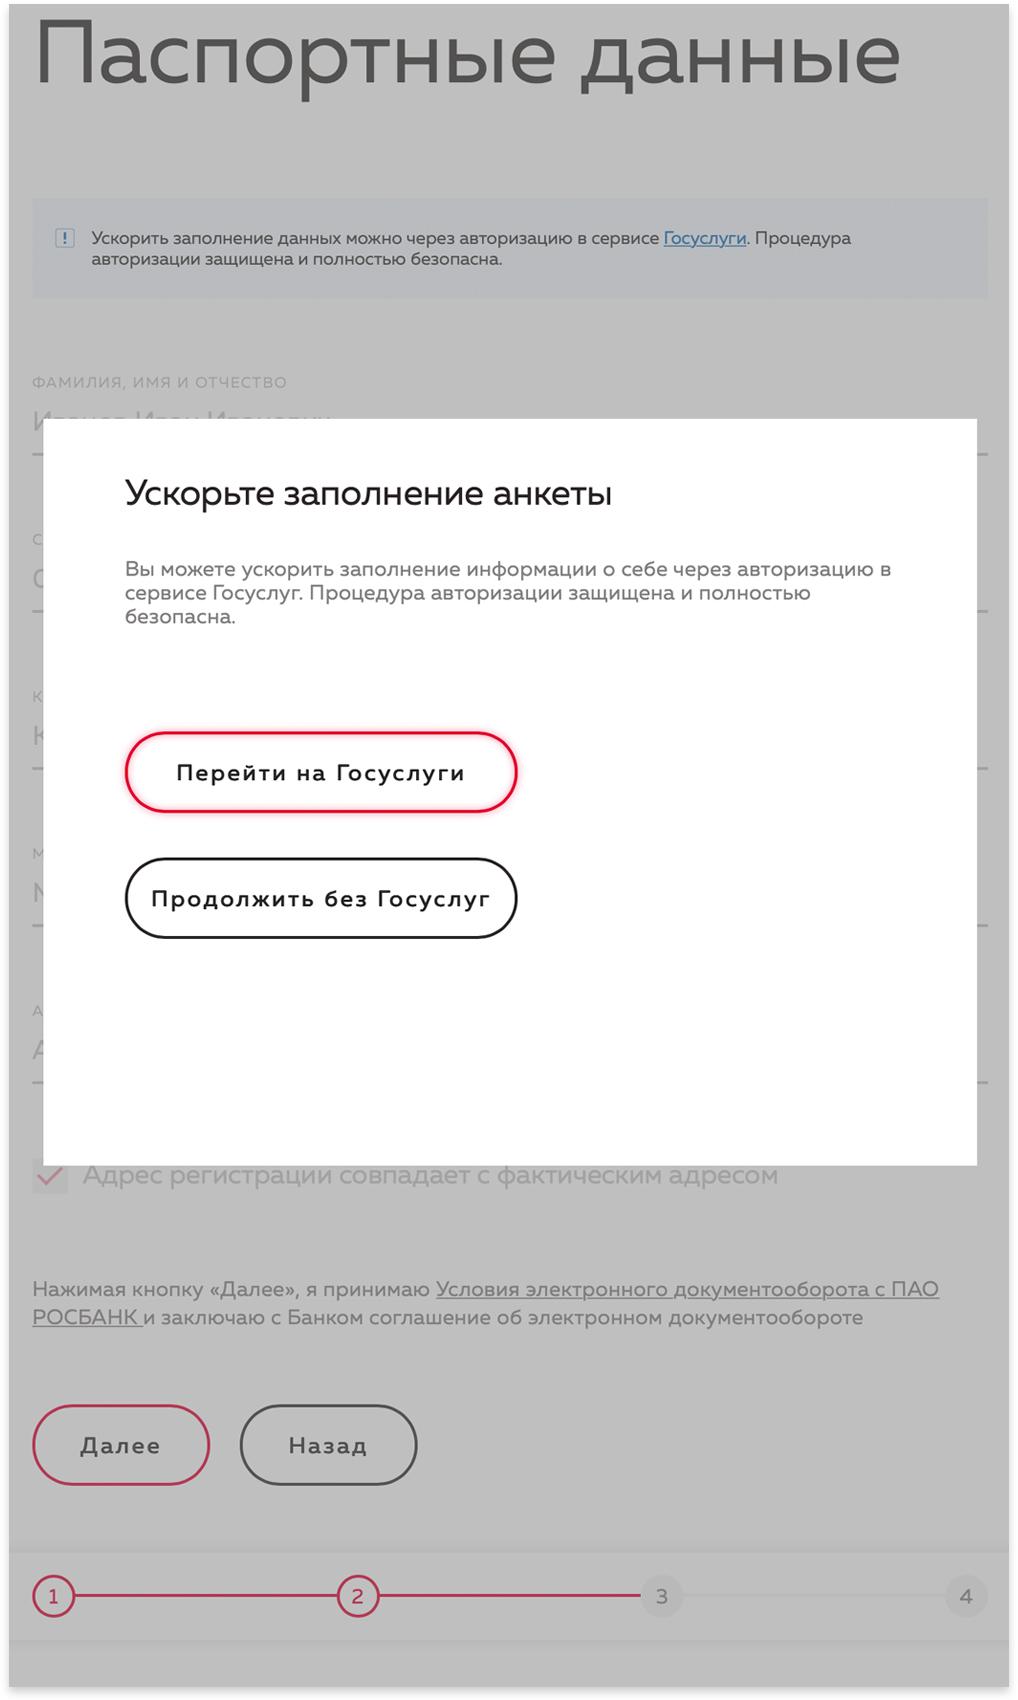 Банк росбанк заявка на кредит онлайн кредиты без залога поручителей одесса